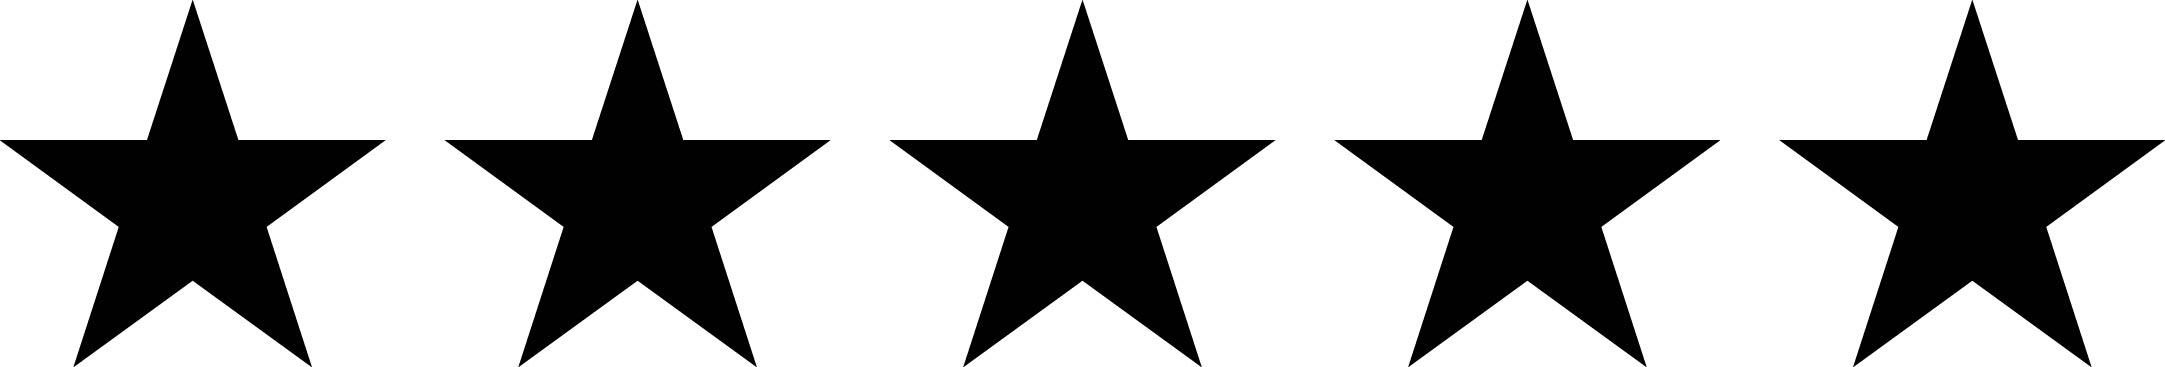 Dr. 2 Review Five Stars EthiopianAmerica